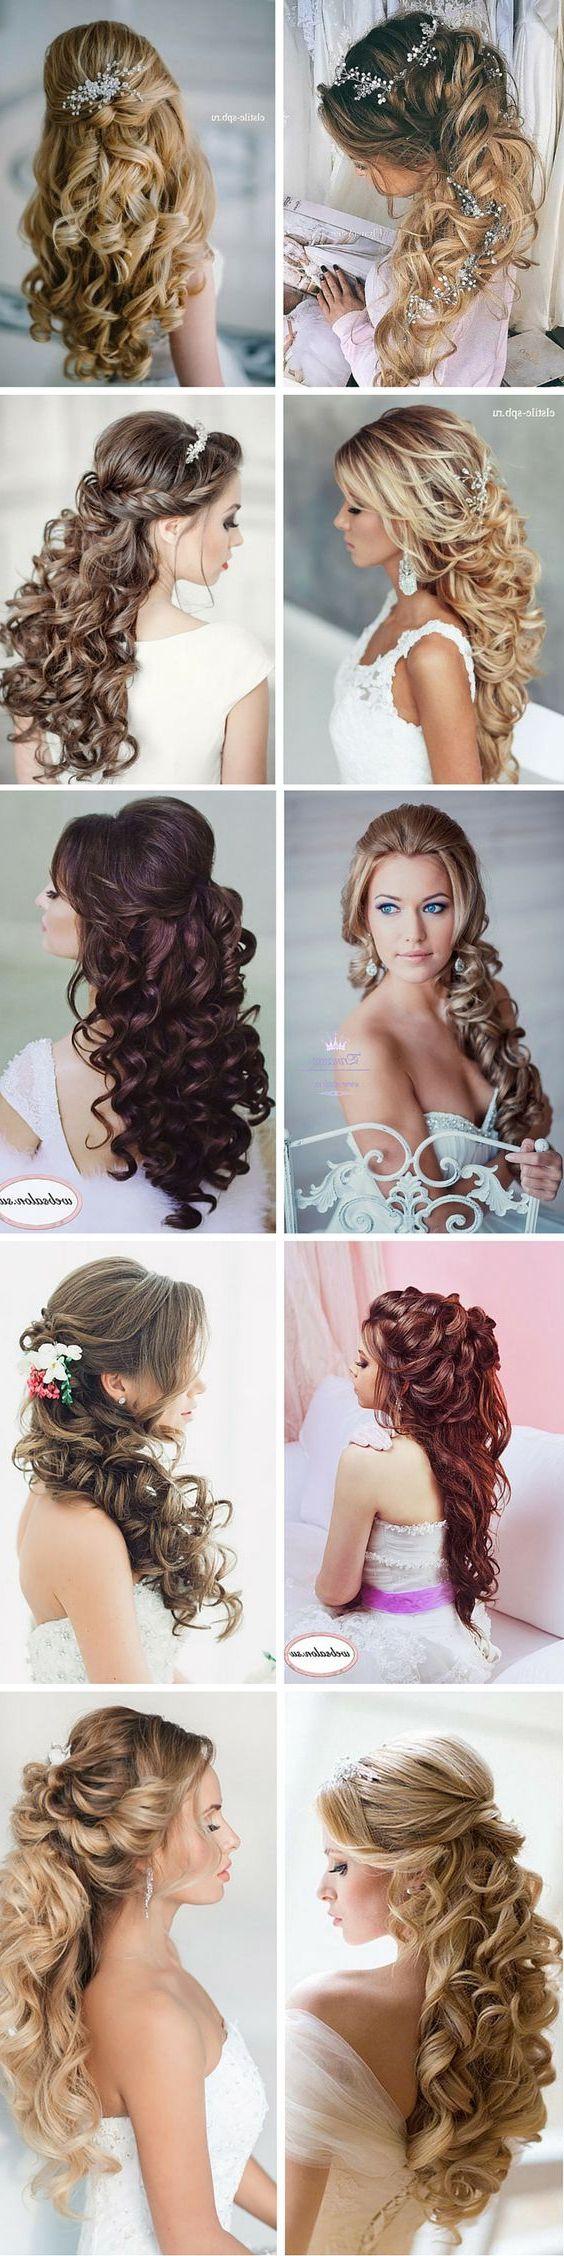 best idee matrimonio images on pinterest make up wedding hair